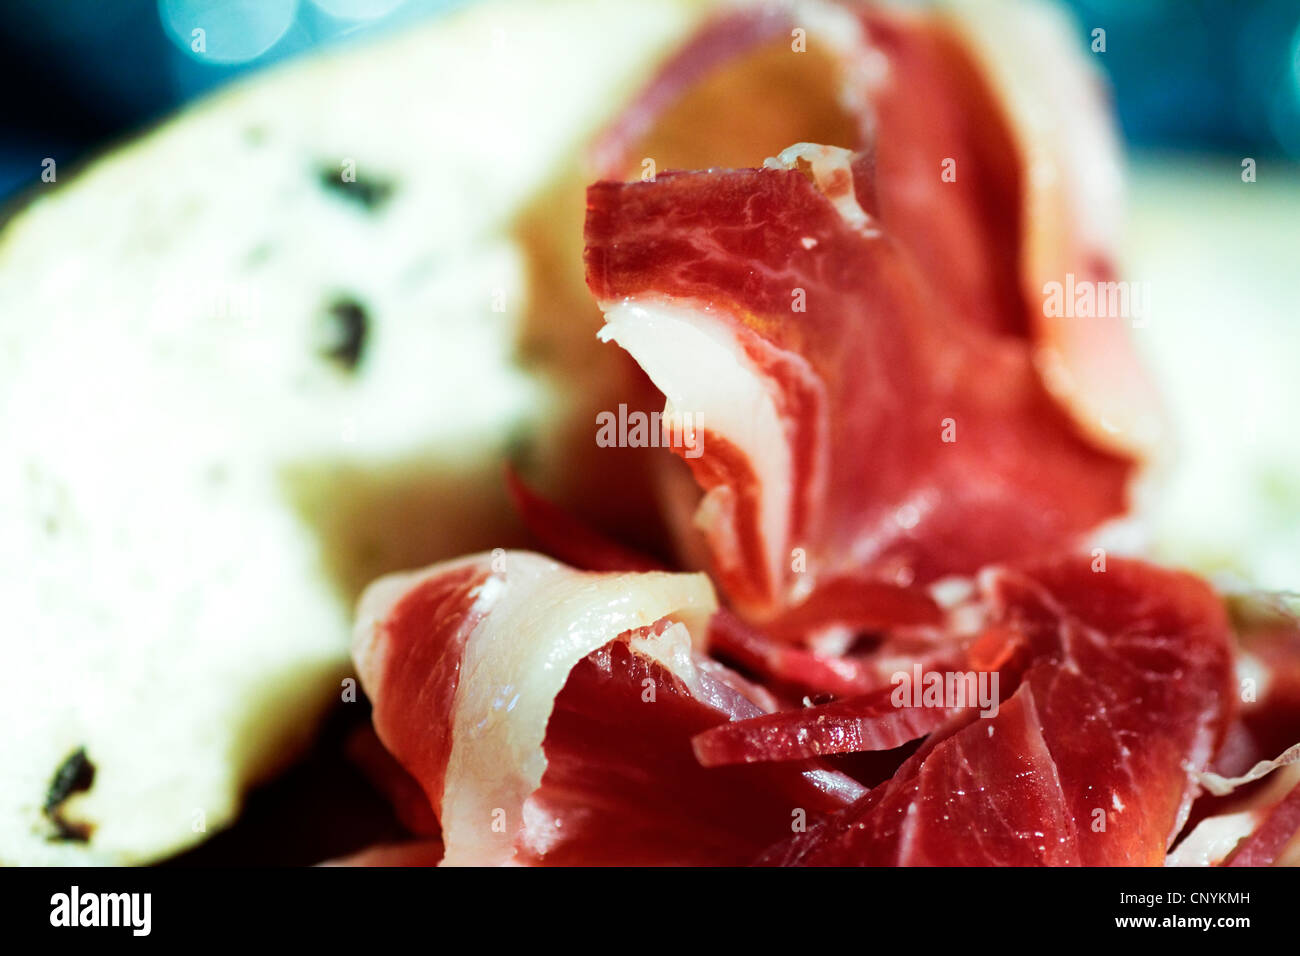 iberian, food, pig, serrano, meat, gastronomy, delicatessen, dehesa, cured, spain, jabugo, mediterranean, iberico, - Stock Image